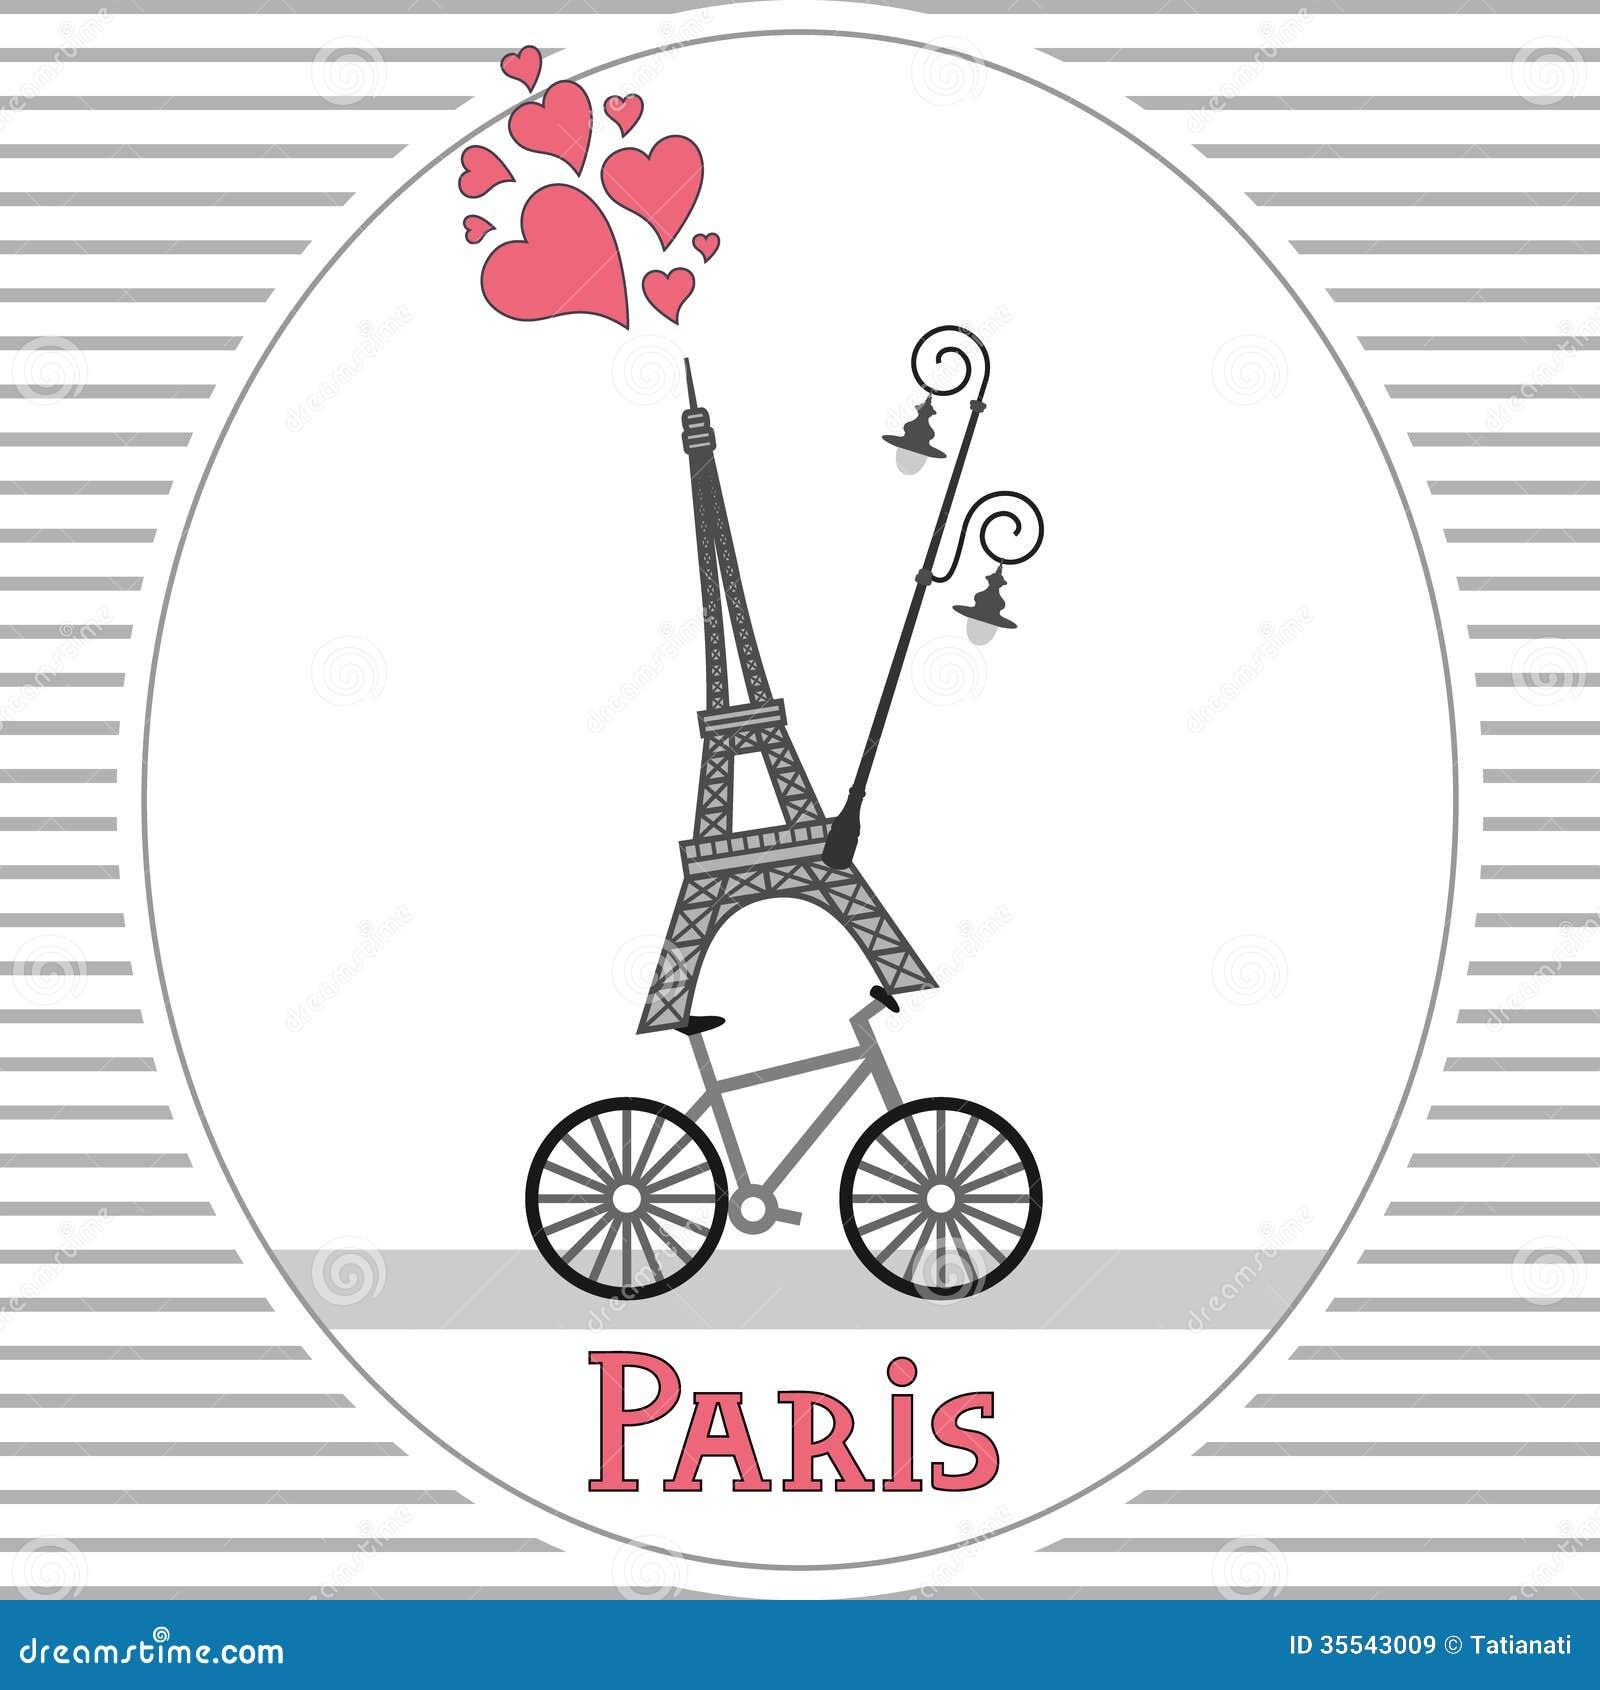 Paris bike card royalty free stock images image 35543009 for Paris orange card